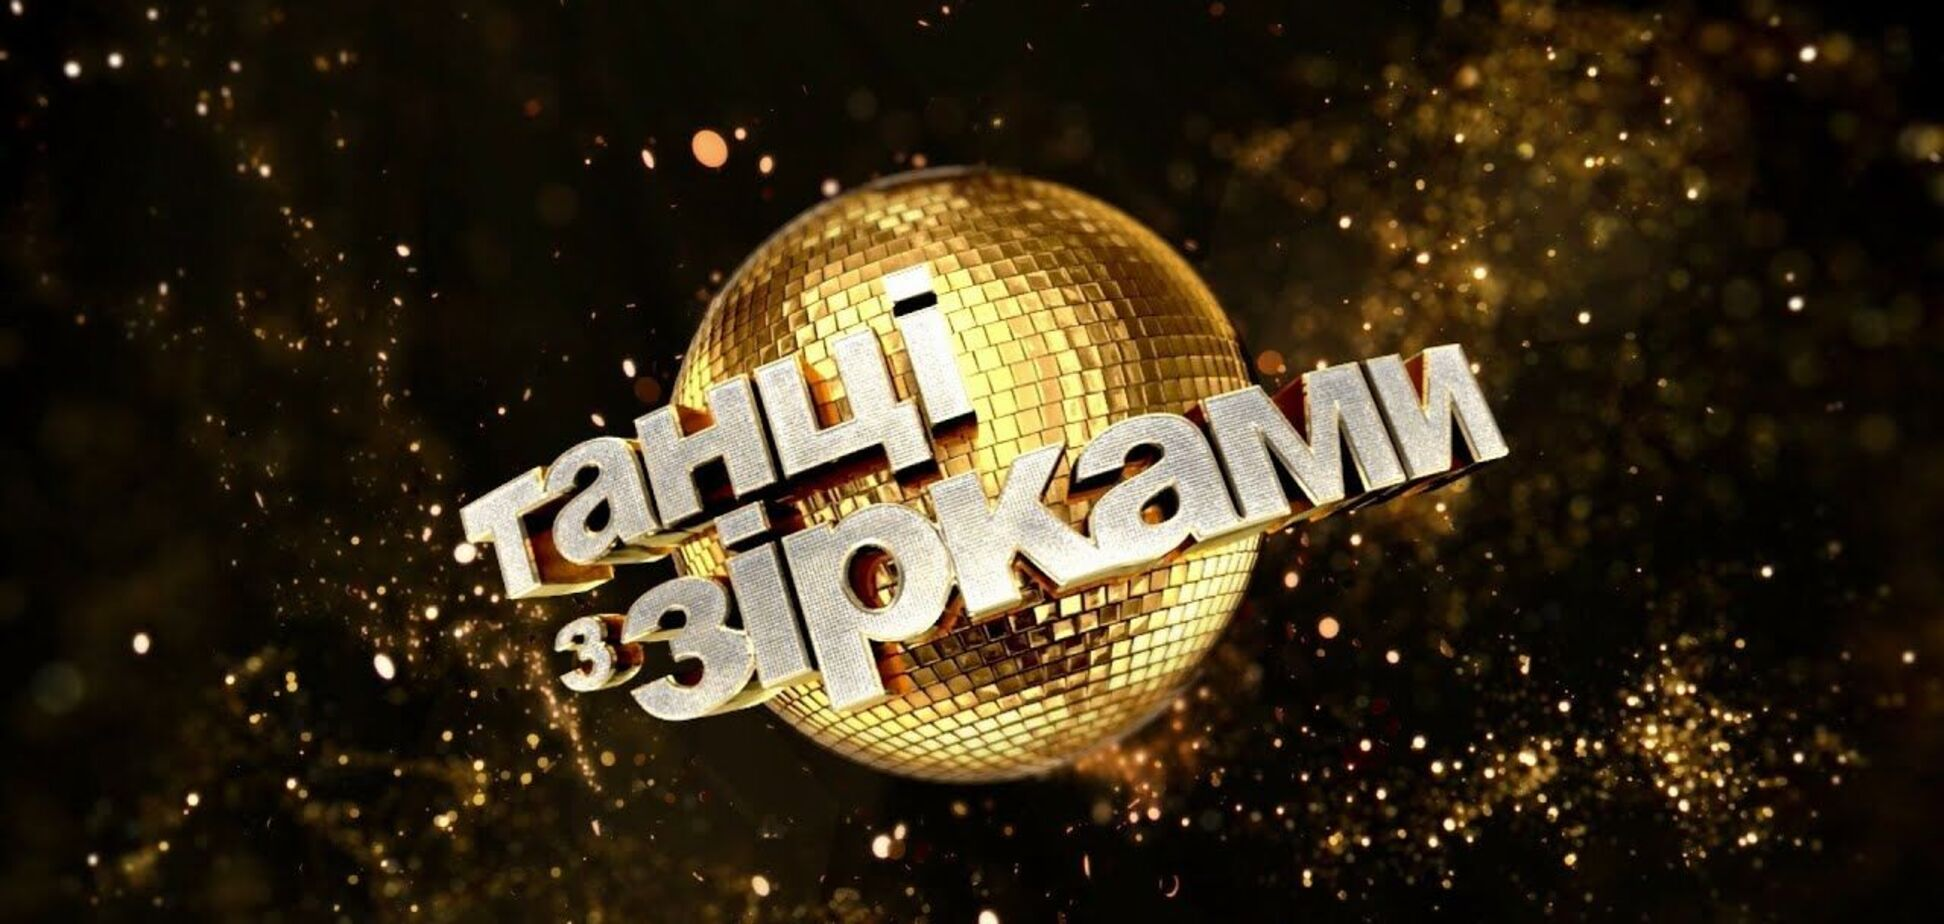 Финал шоу 'Танці з зірками 2020': кто выиграл и где смотреть онлайн выпуск